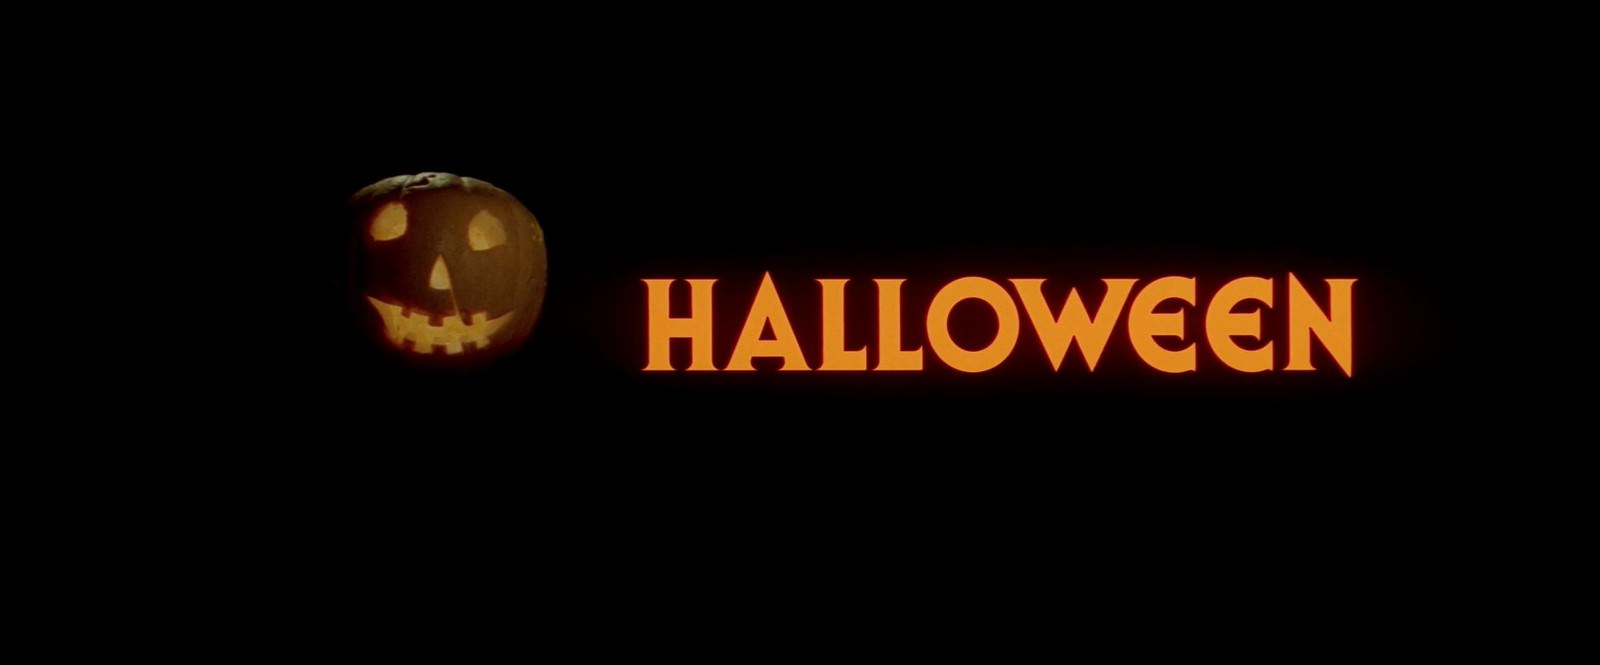 Movie, Halloween(美國, 1978年) / 月光光心慌慌(台灣), 電影畫面